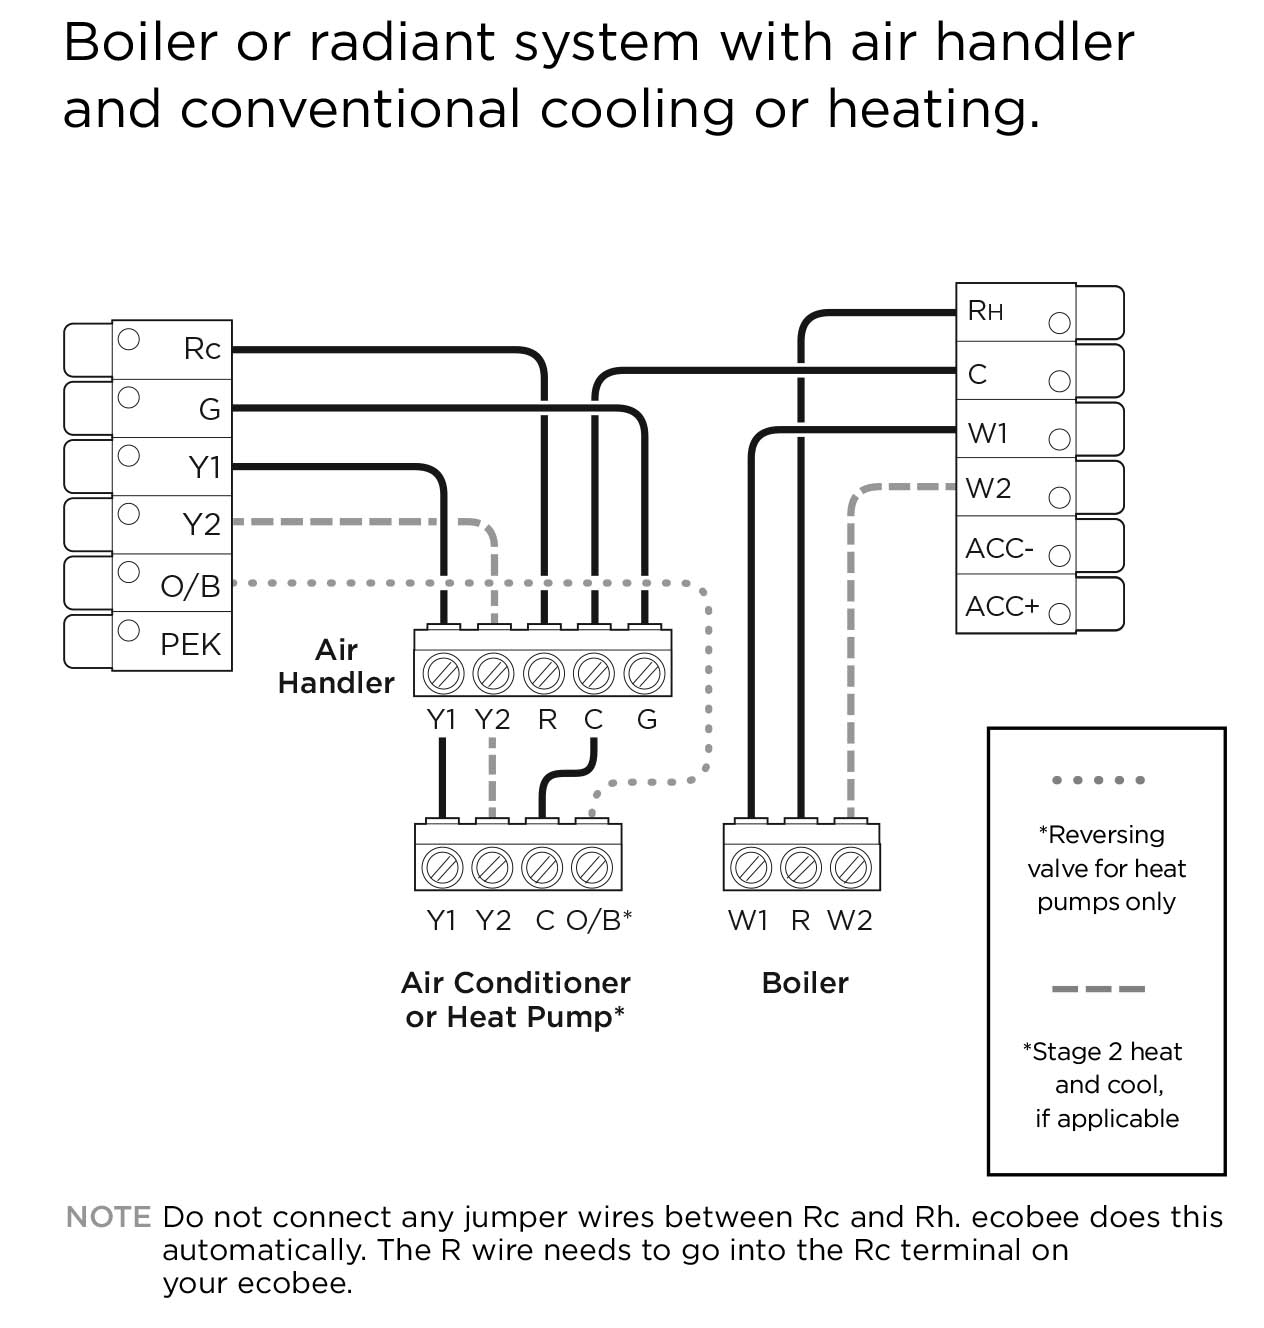 Ecobee4 Wiring Diagrams – Ecobee Support - Heatpump Wiring Diagram